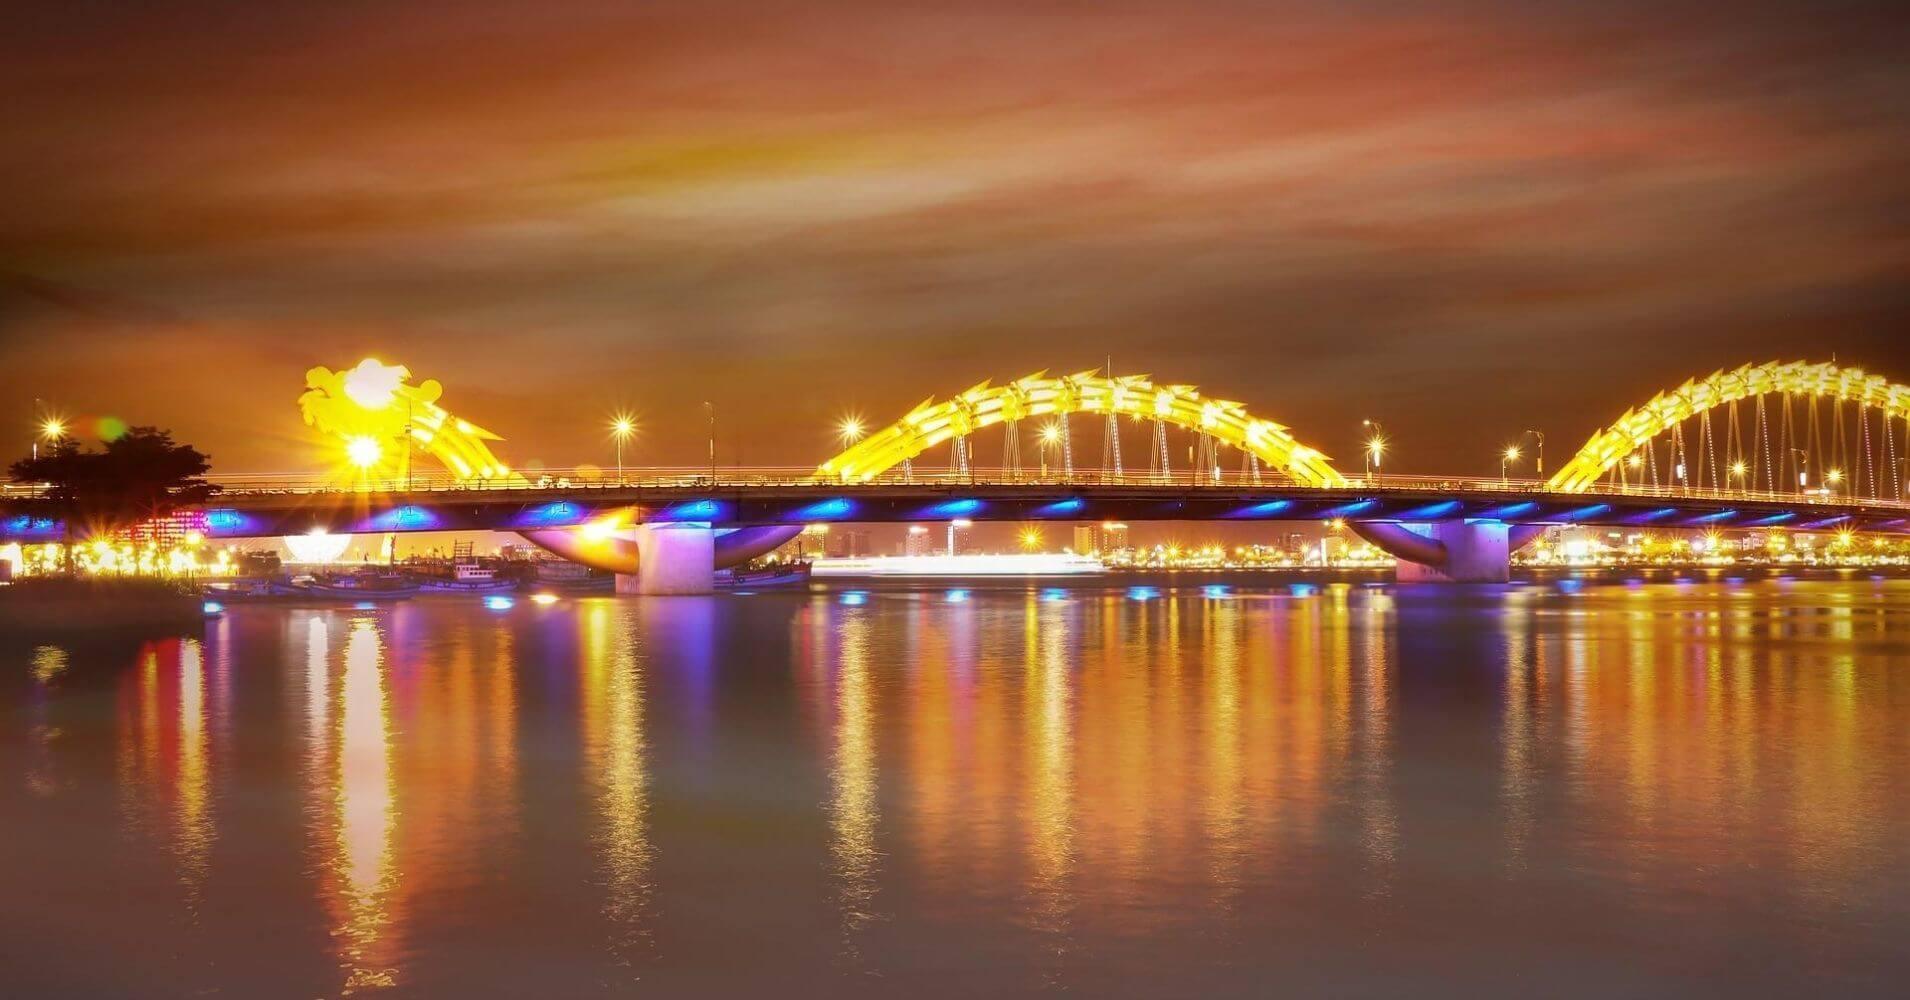 Puente del Dragón. Da Nang, Vietnam. Foto: Anh Tuan Phan.